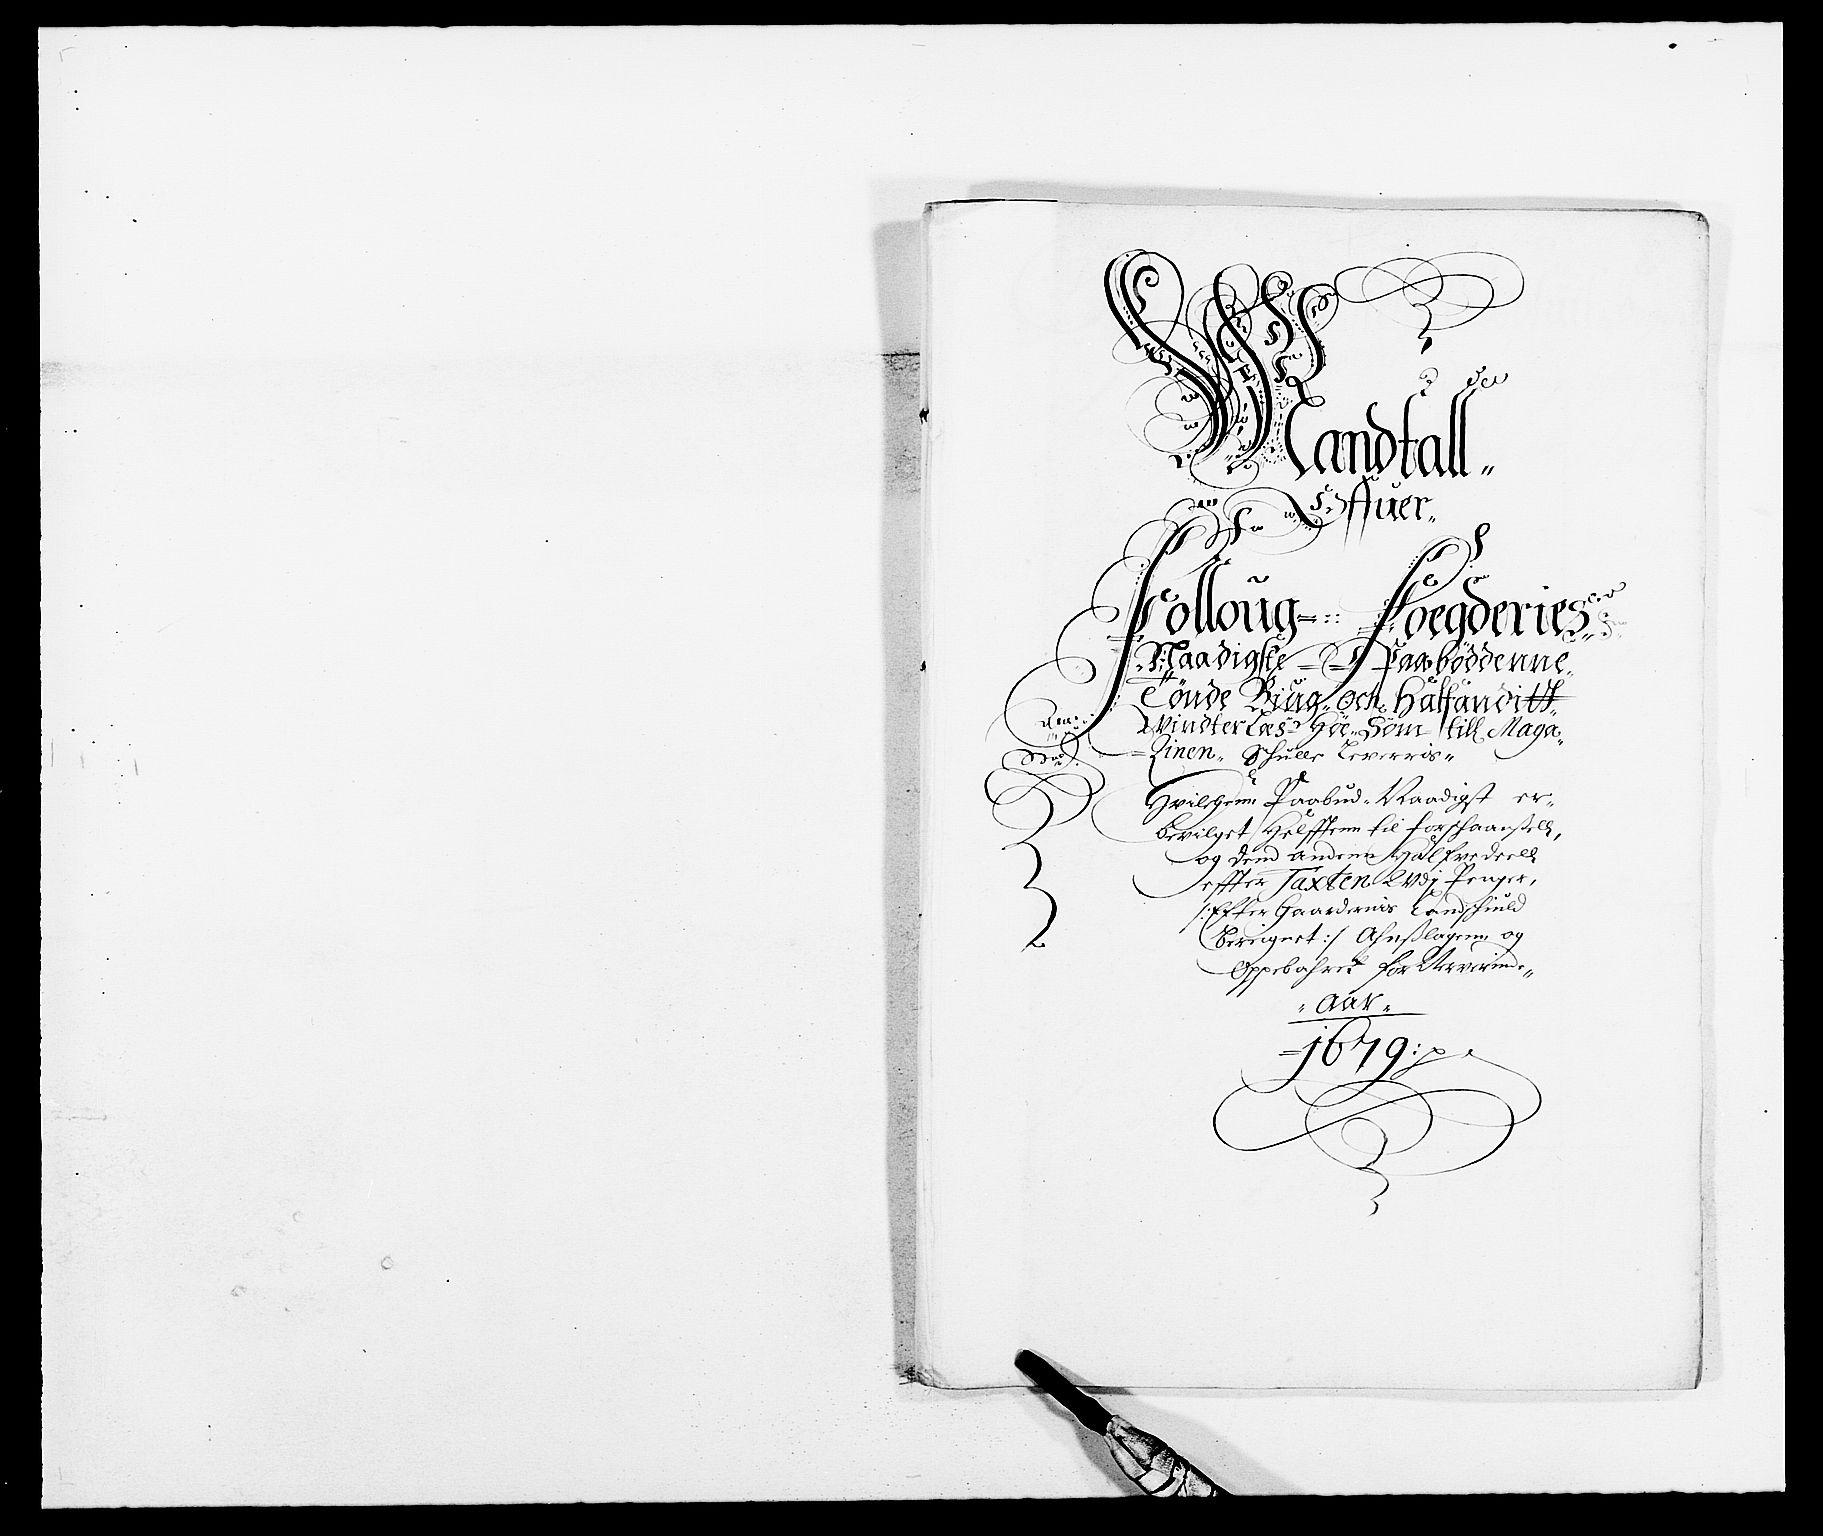 RA, Rentekammeret inntil 1814, Reviderte regnskaper, Fogderegnskap, R09/L0428: Fogderegnskap Follo, 1679, s. 195